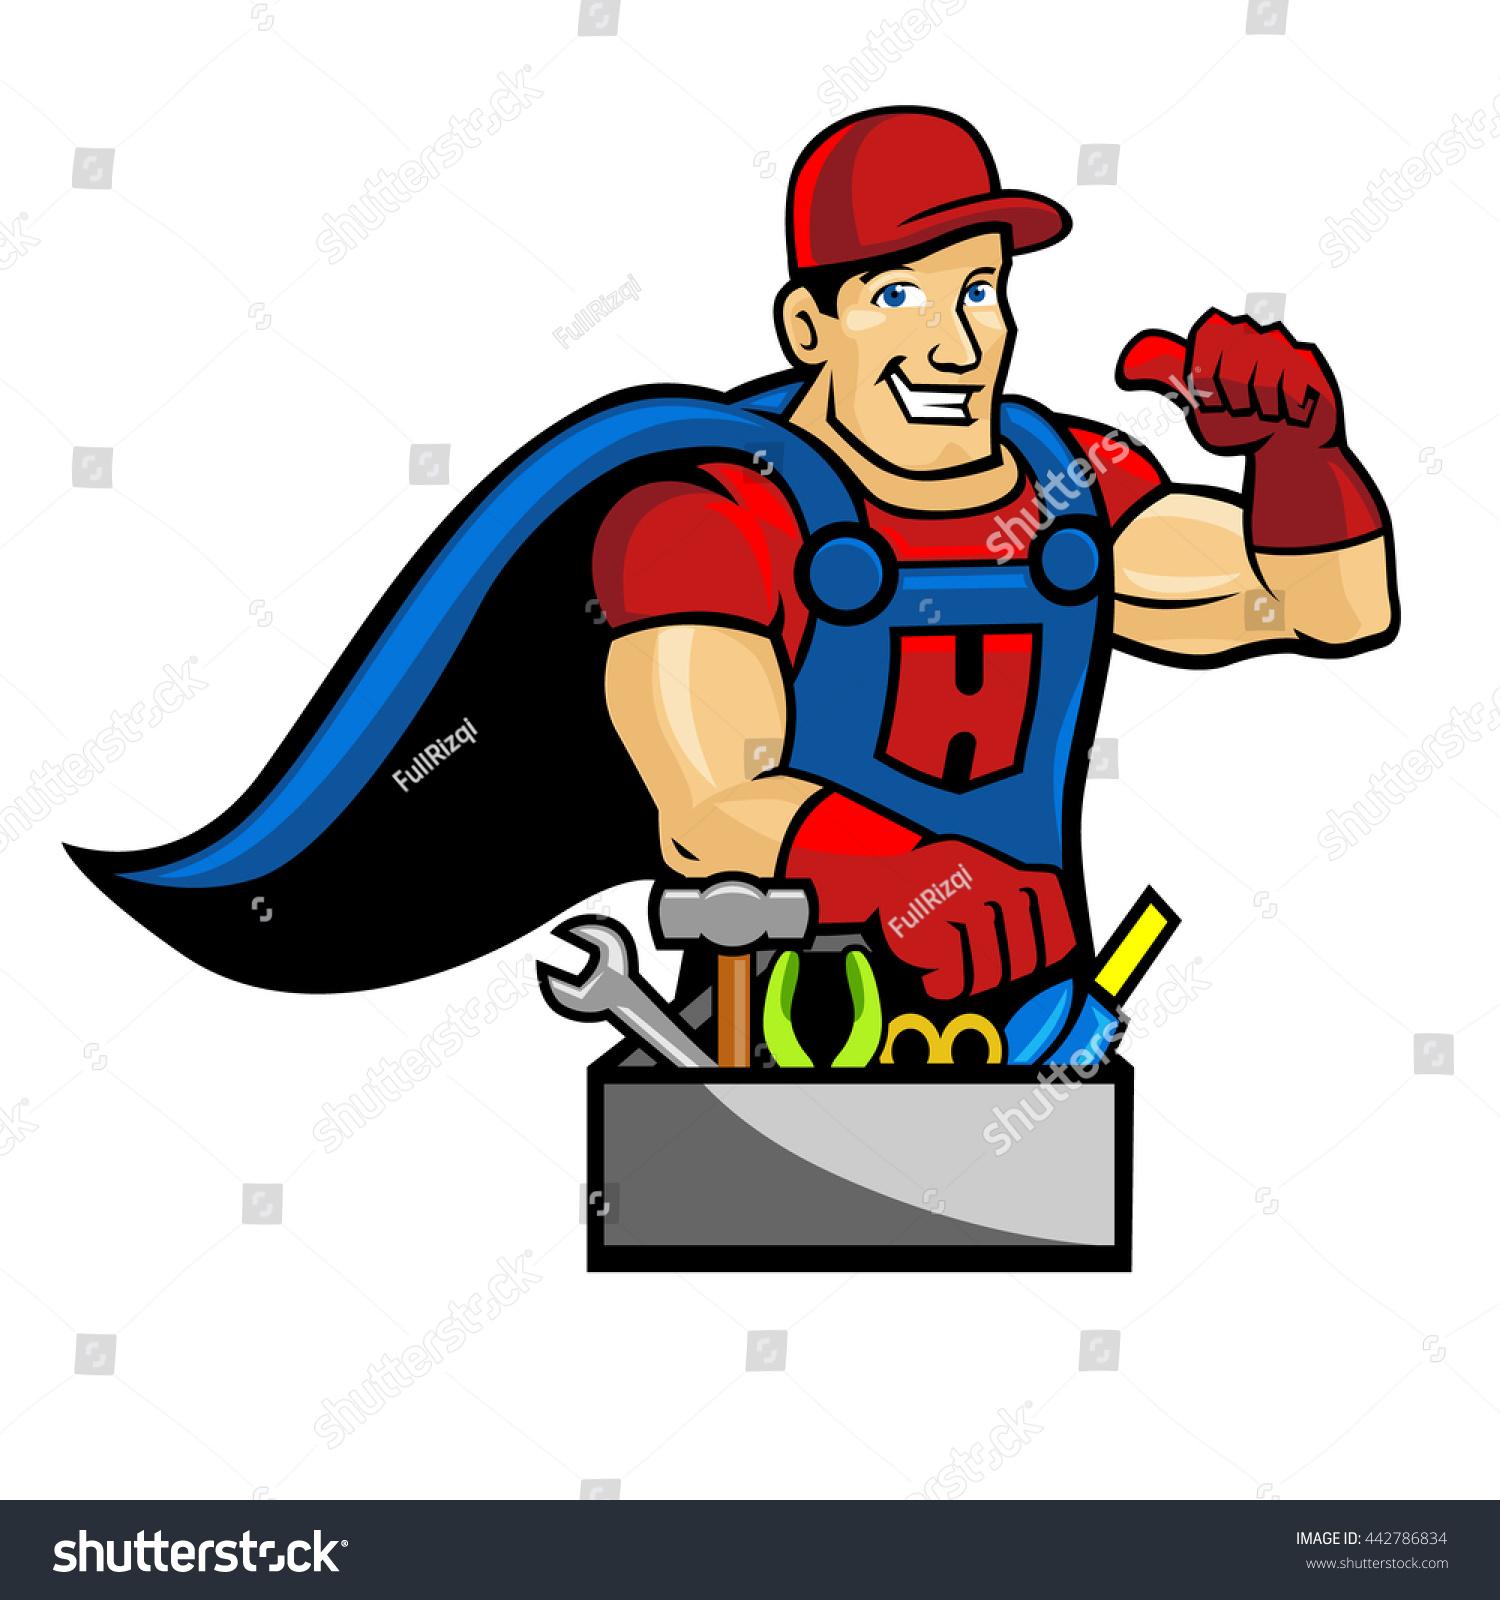 handyman character super handyman stock vector 442786834